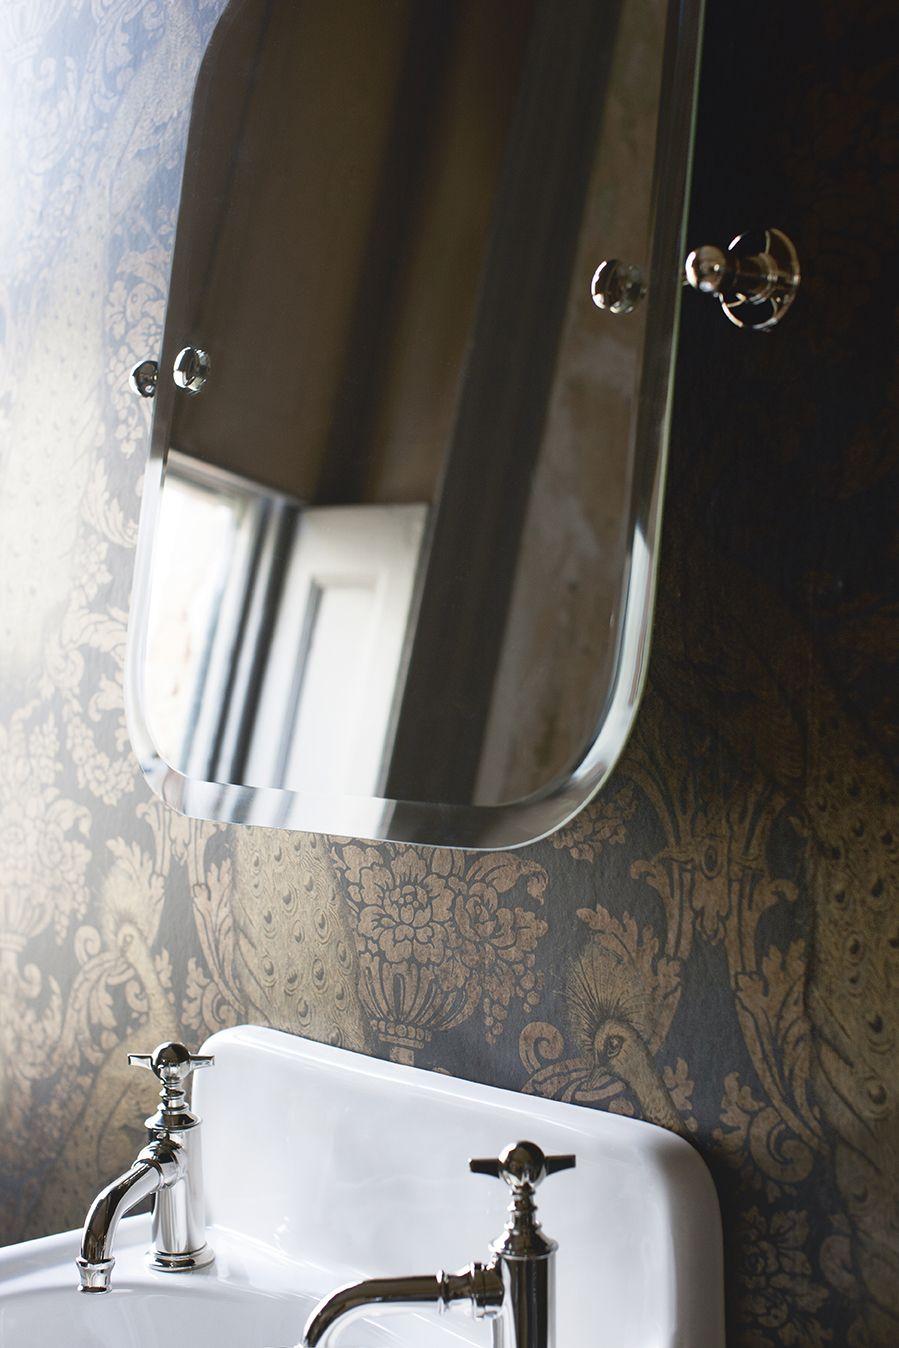 Arcade creates modern bathroom furniture to suit any bathroom space